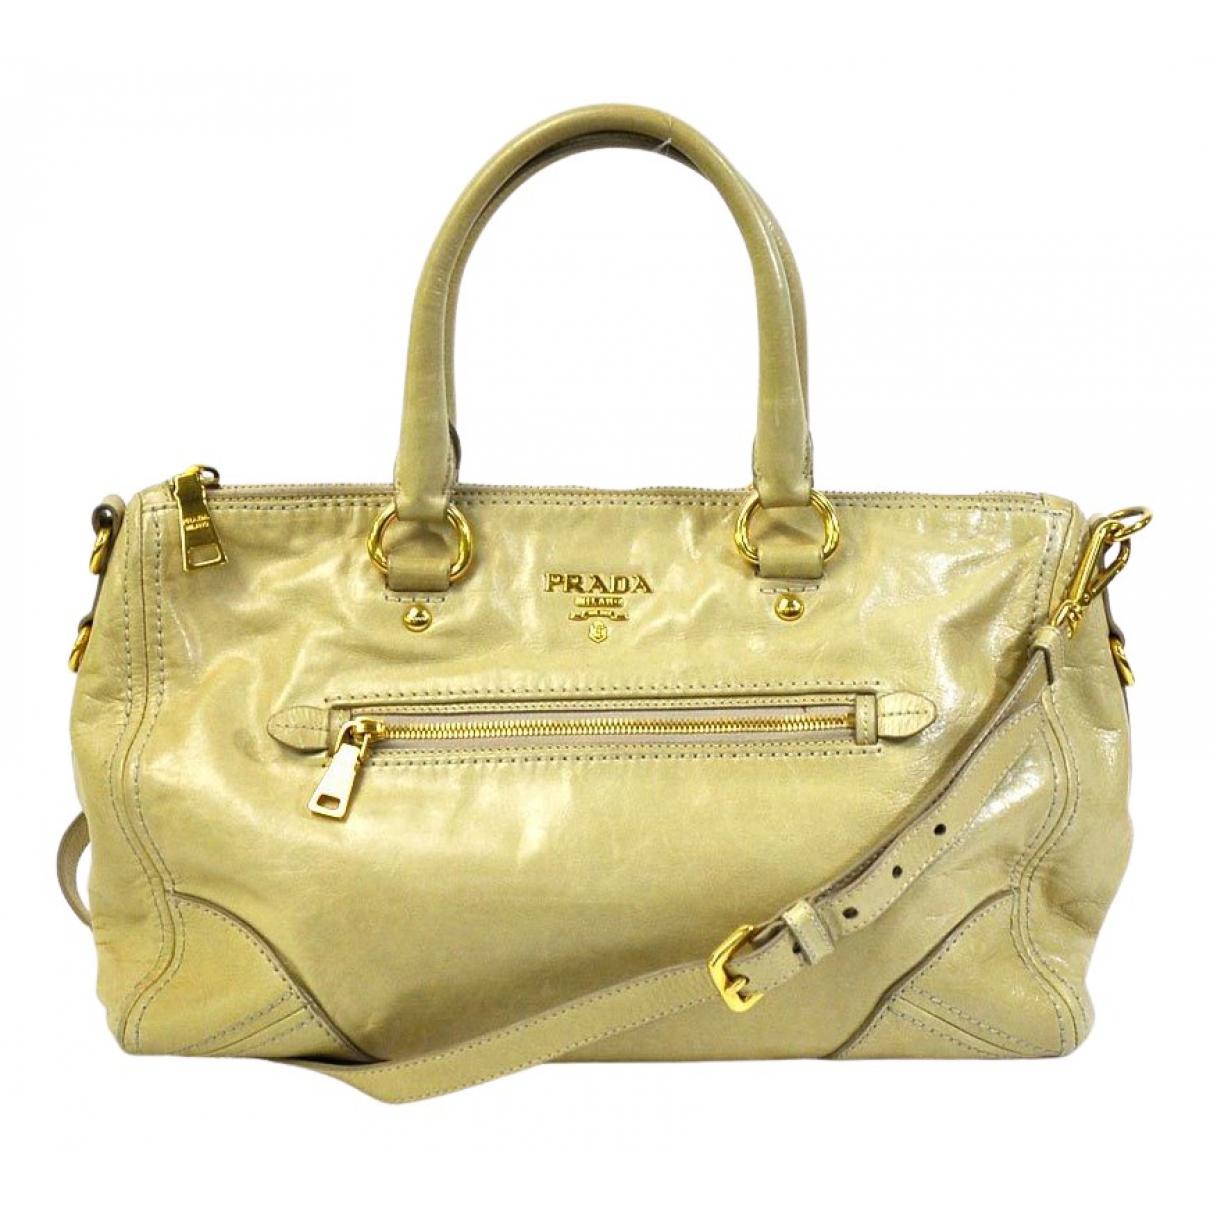 Prada \N Yellow Leather handbag for Women \N